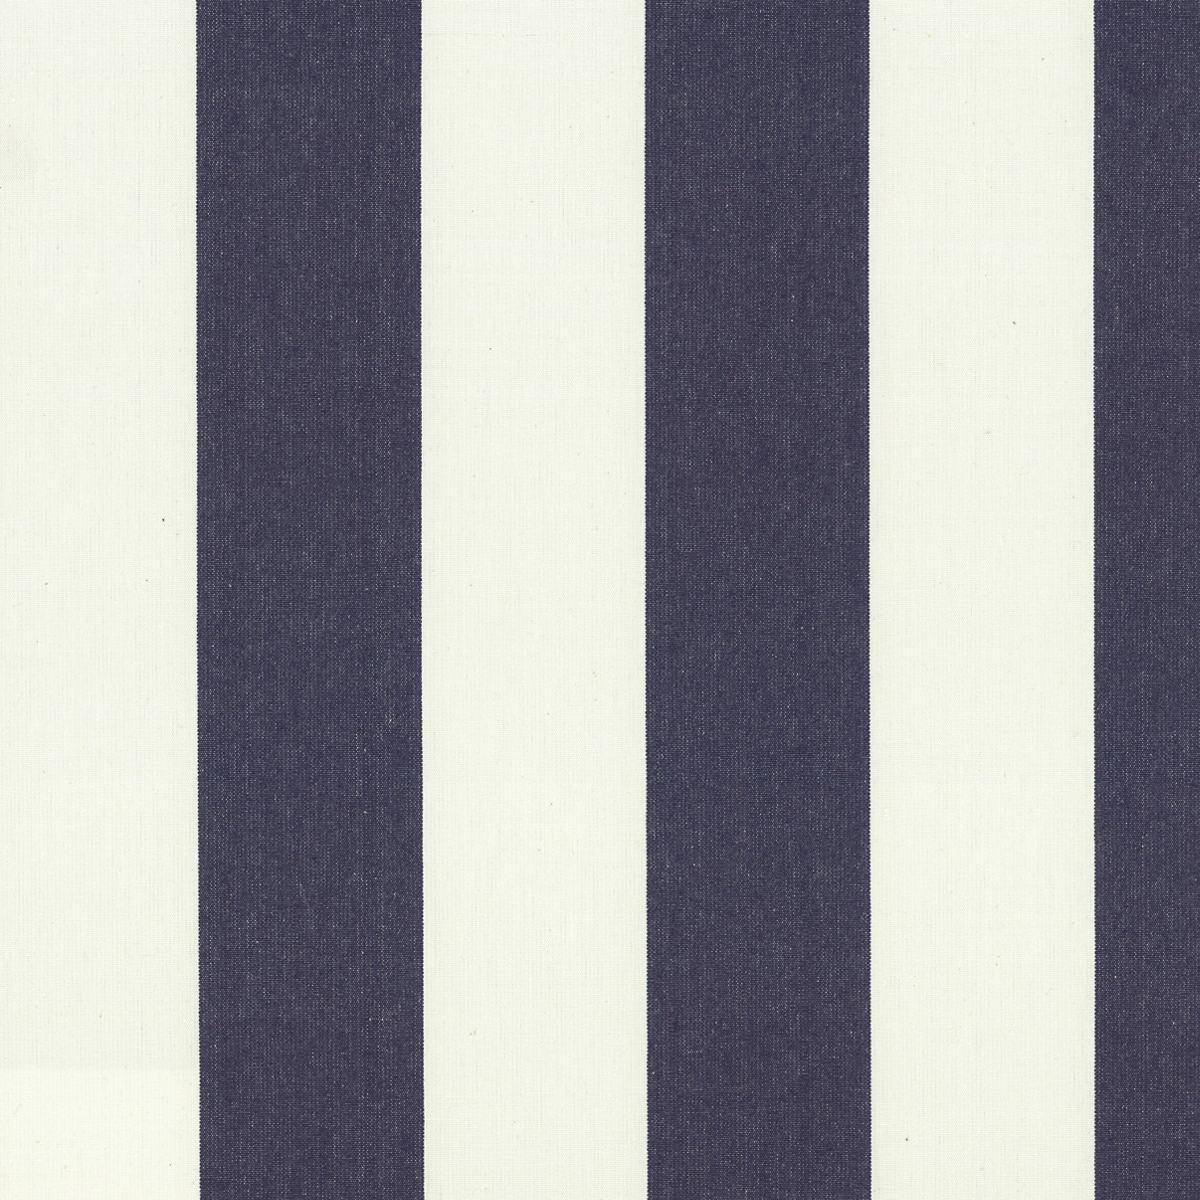 Alex Indigo Fabric